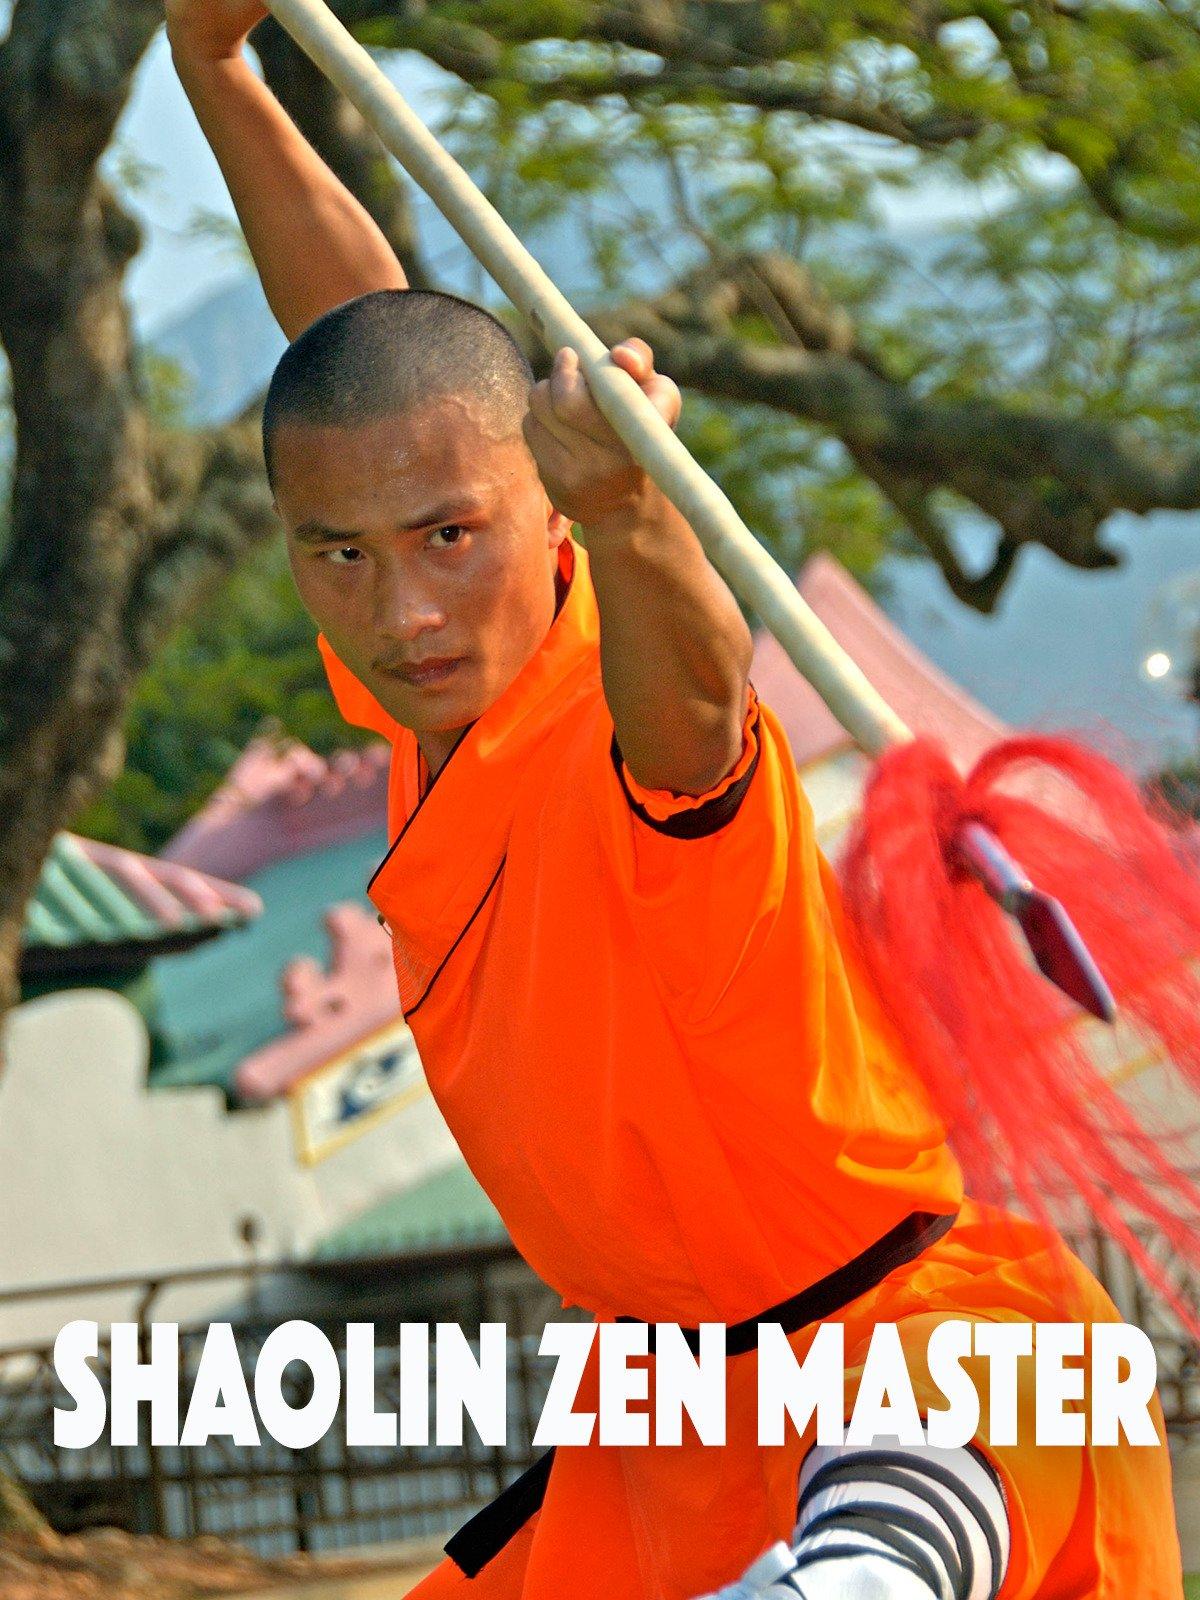 Shaolin Zen Master